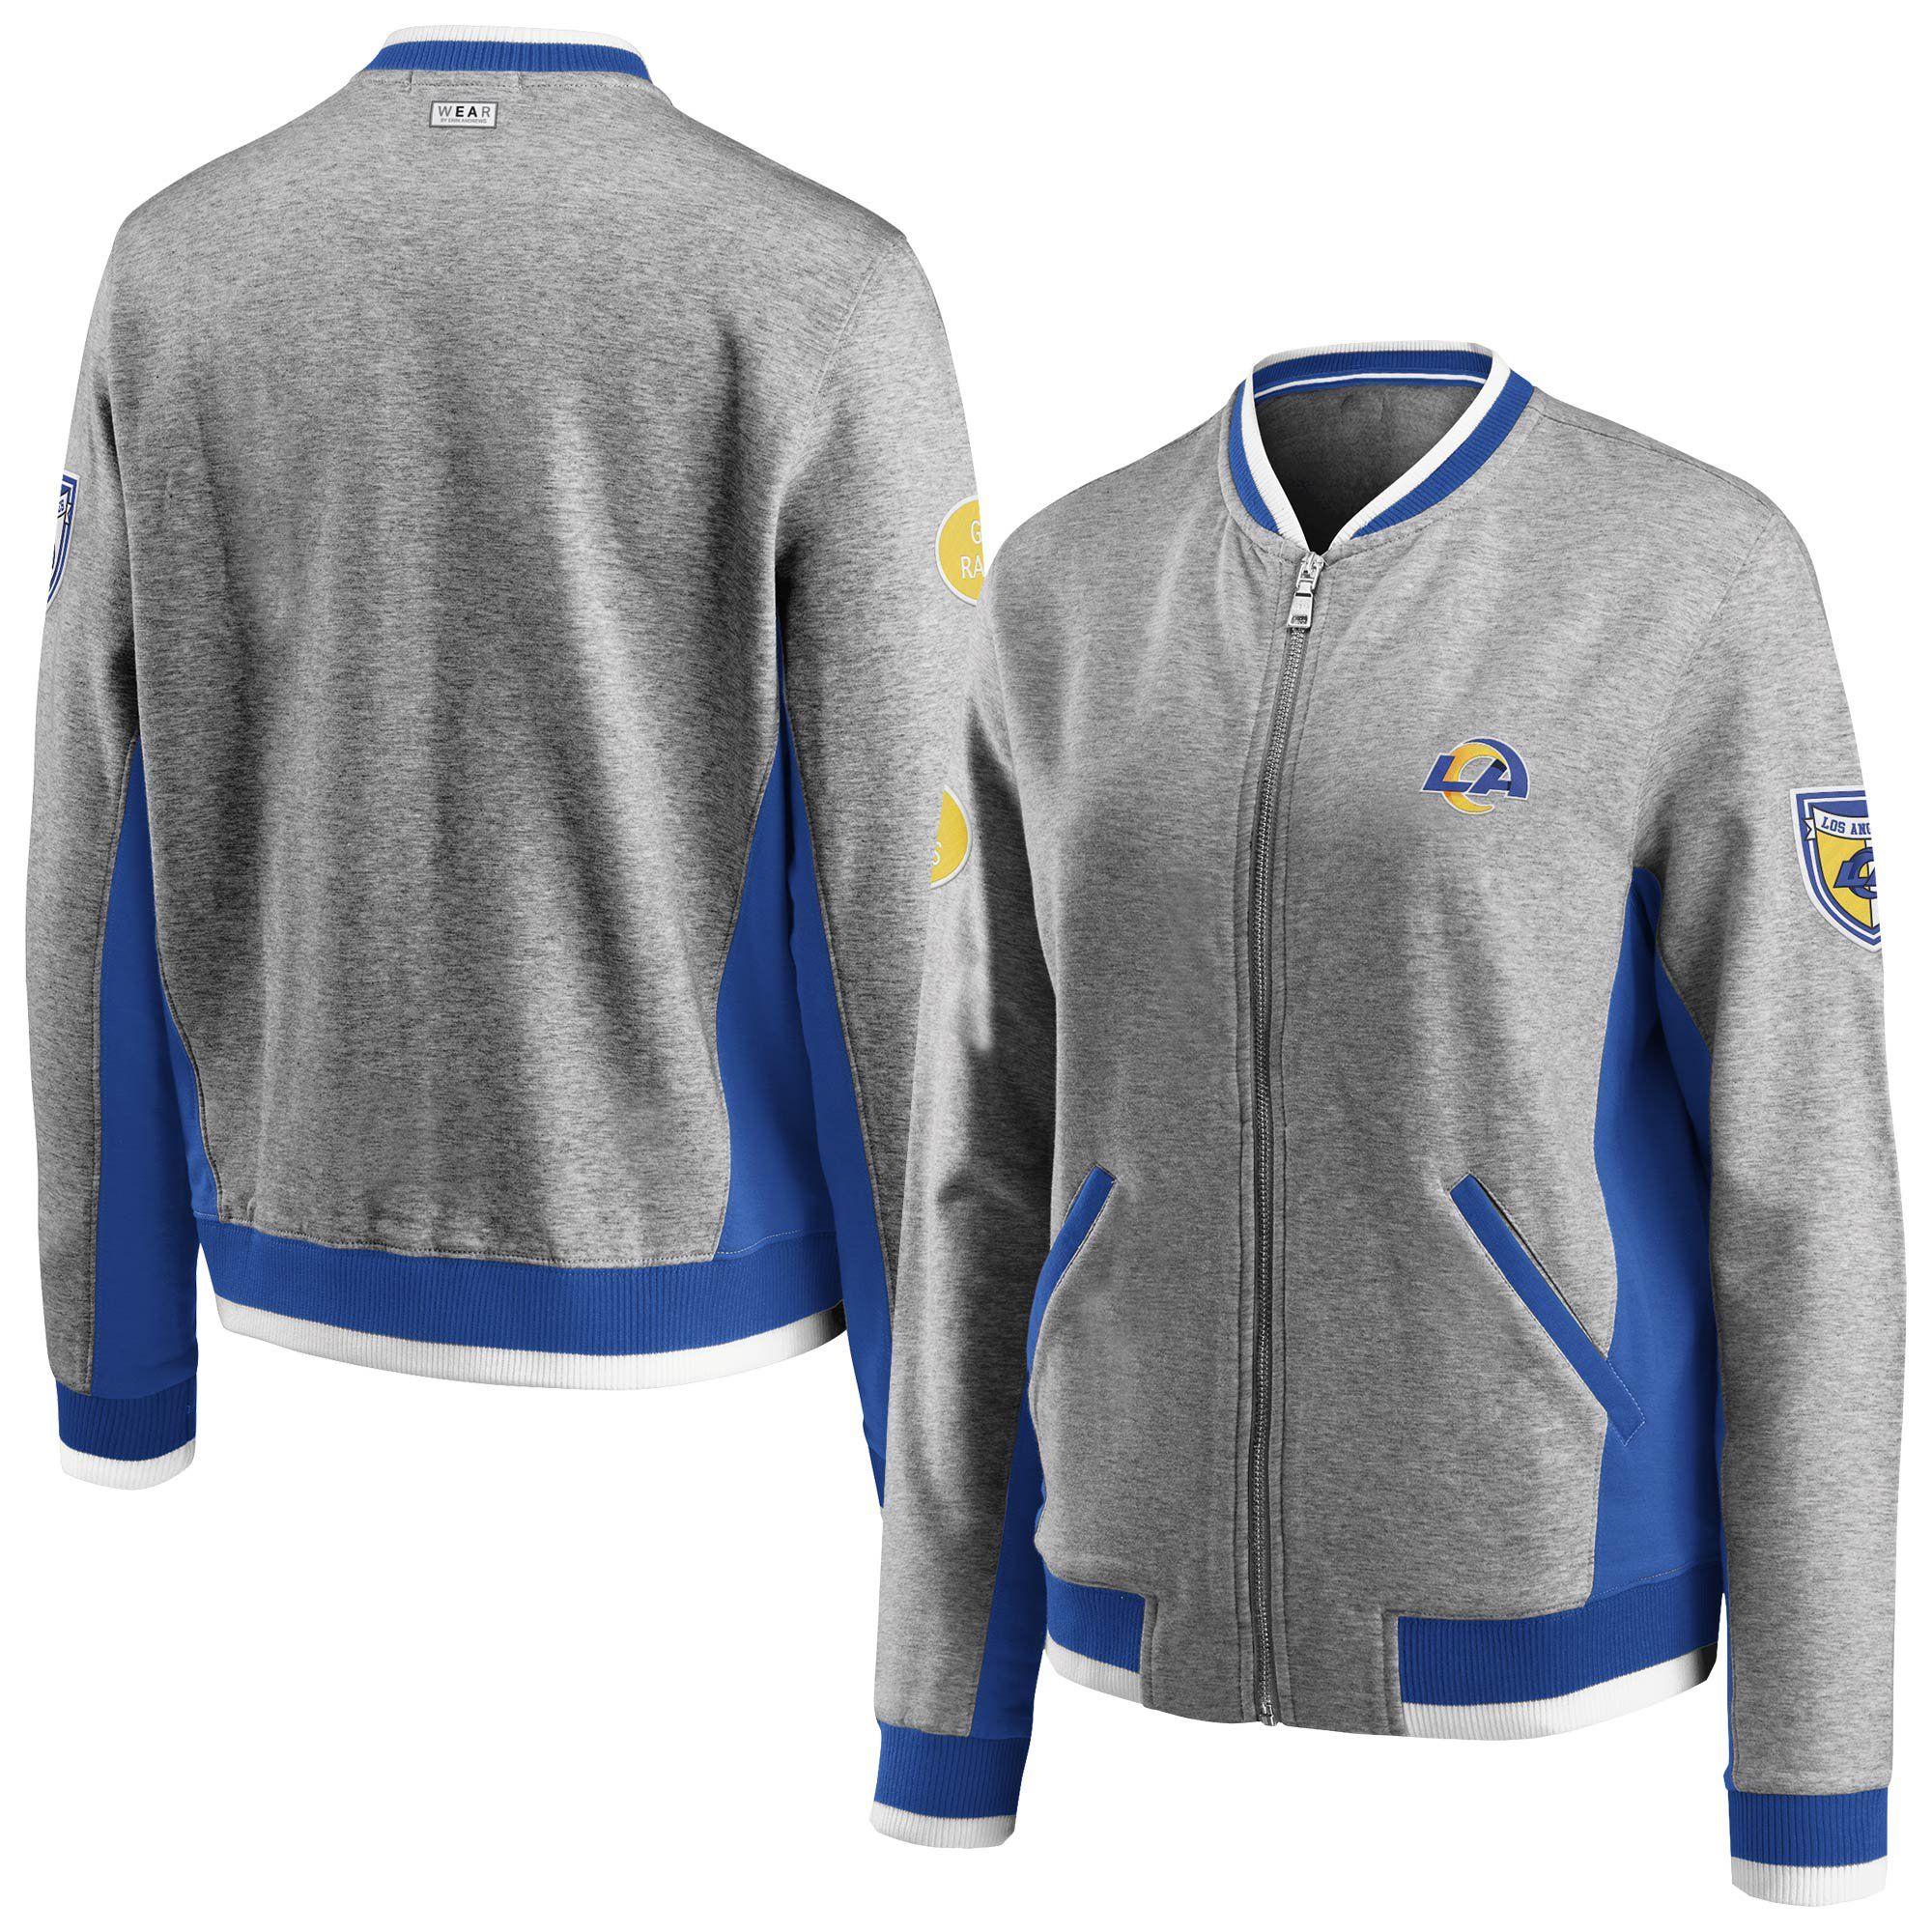 Los Angeles Rams Wear By Erin Andrews Women S Varsity Full Zip Jacket Heathered Gray Walmart Com Walmart Com Zip Jackets Quarter Zip Jacket How To Wear